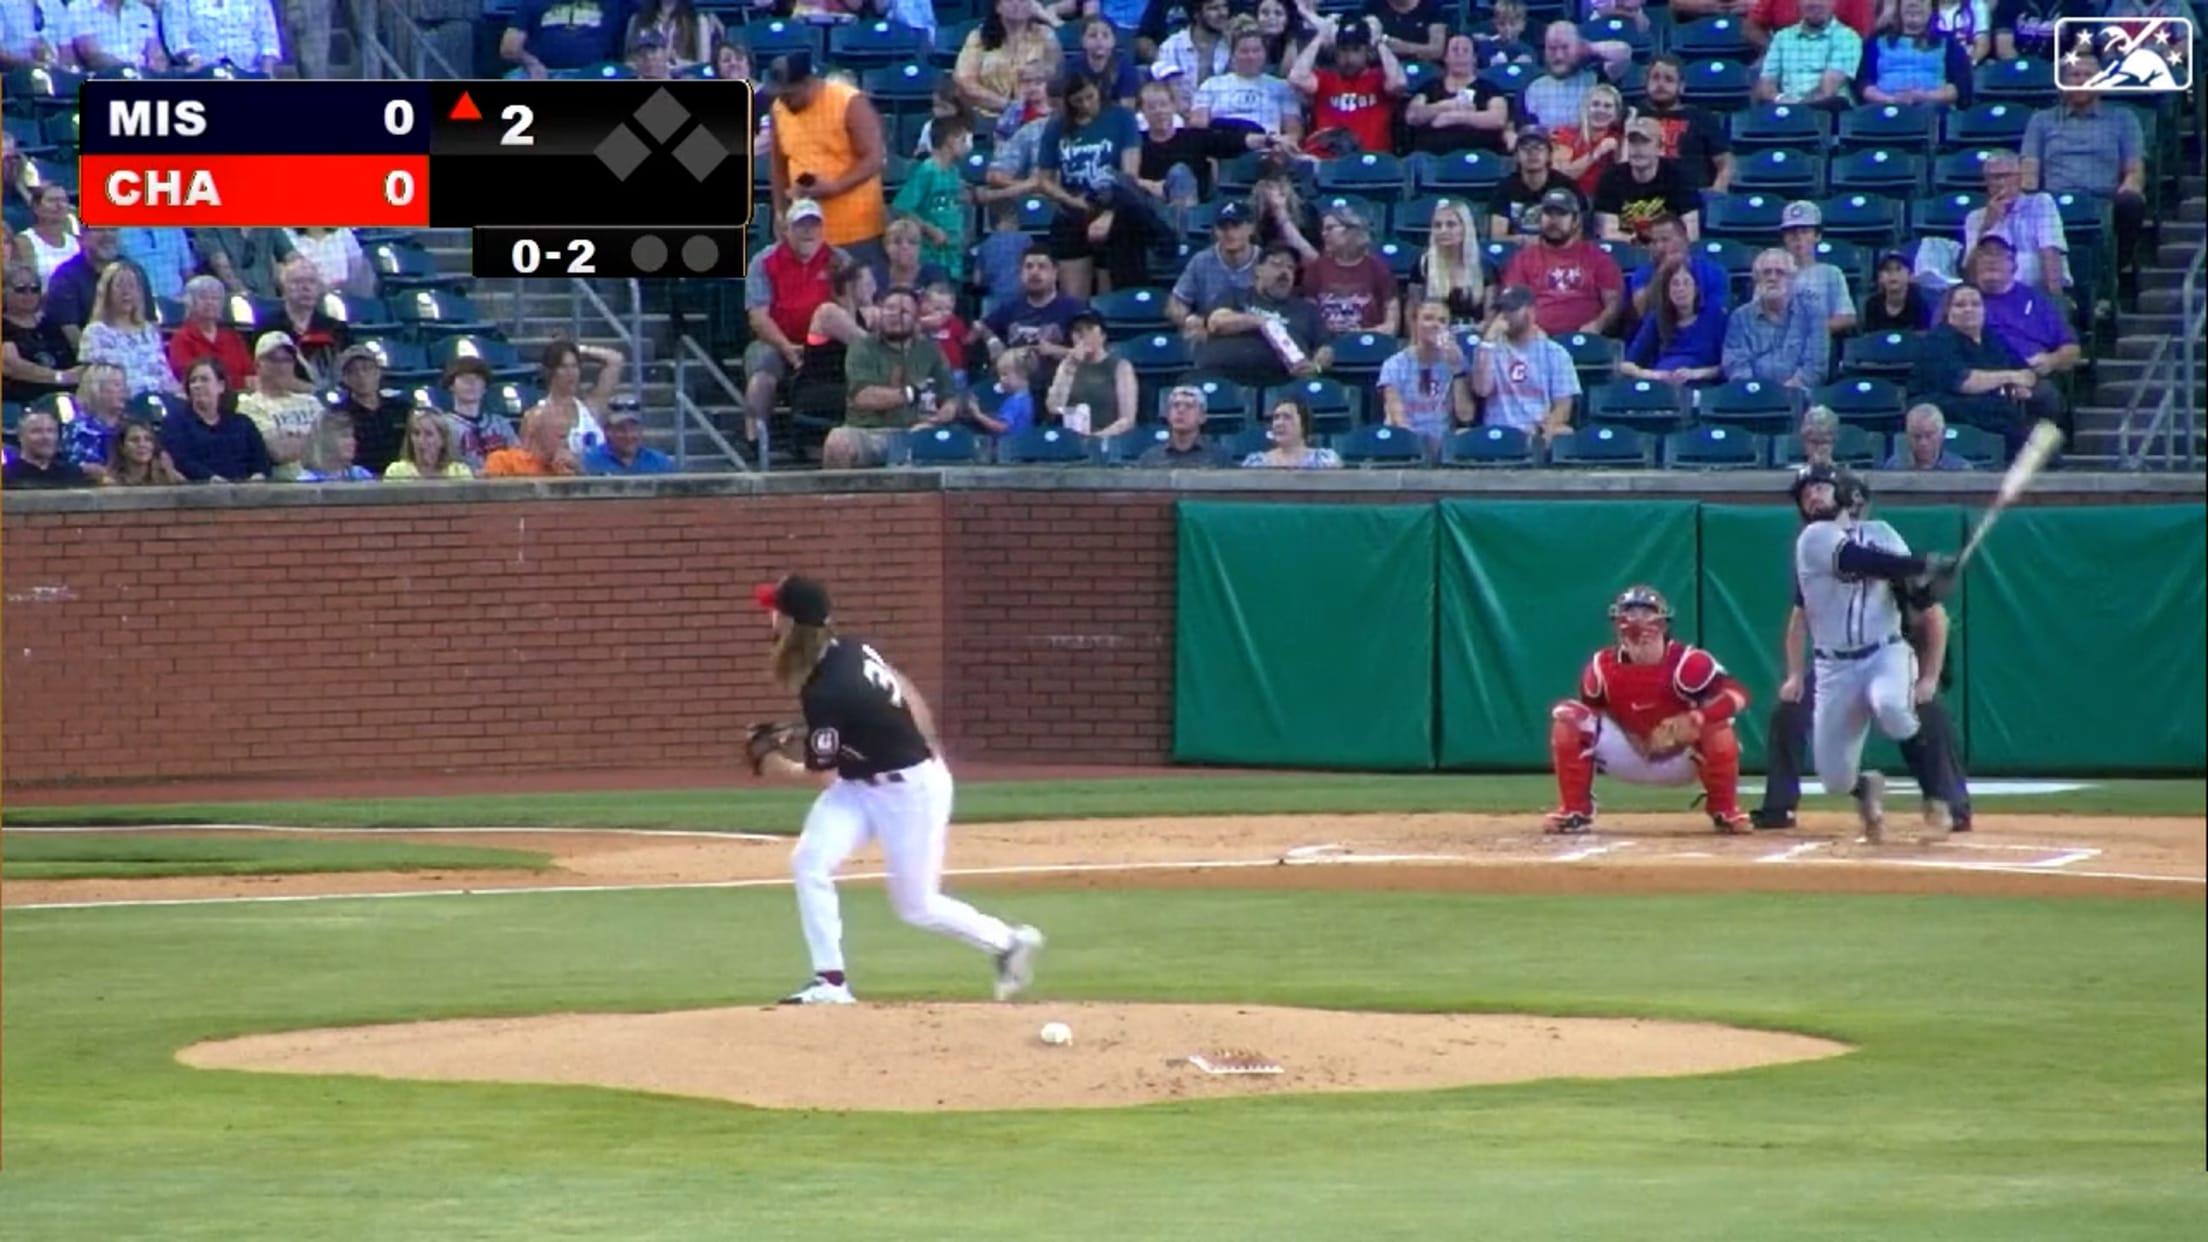 Langeliers swats 22nd home run